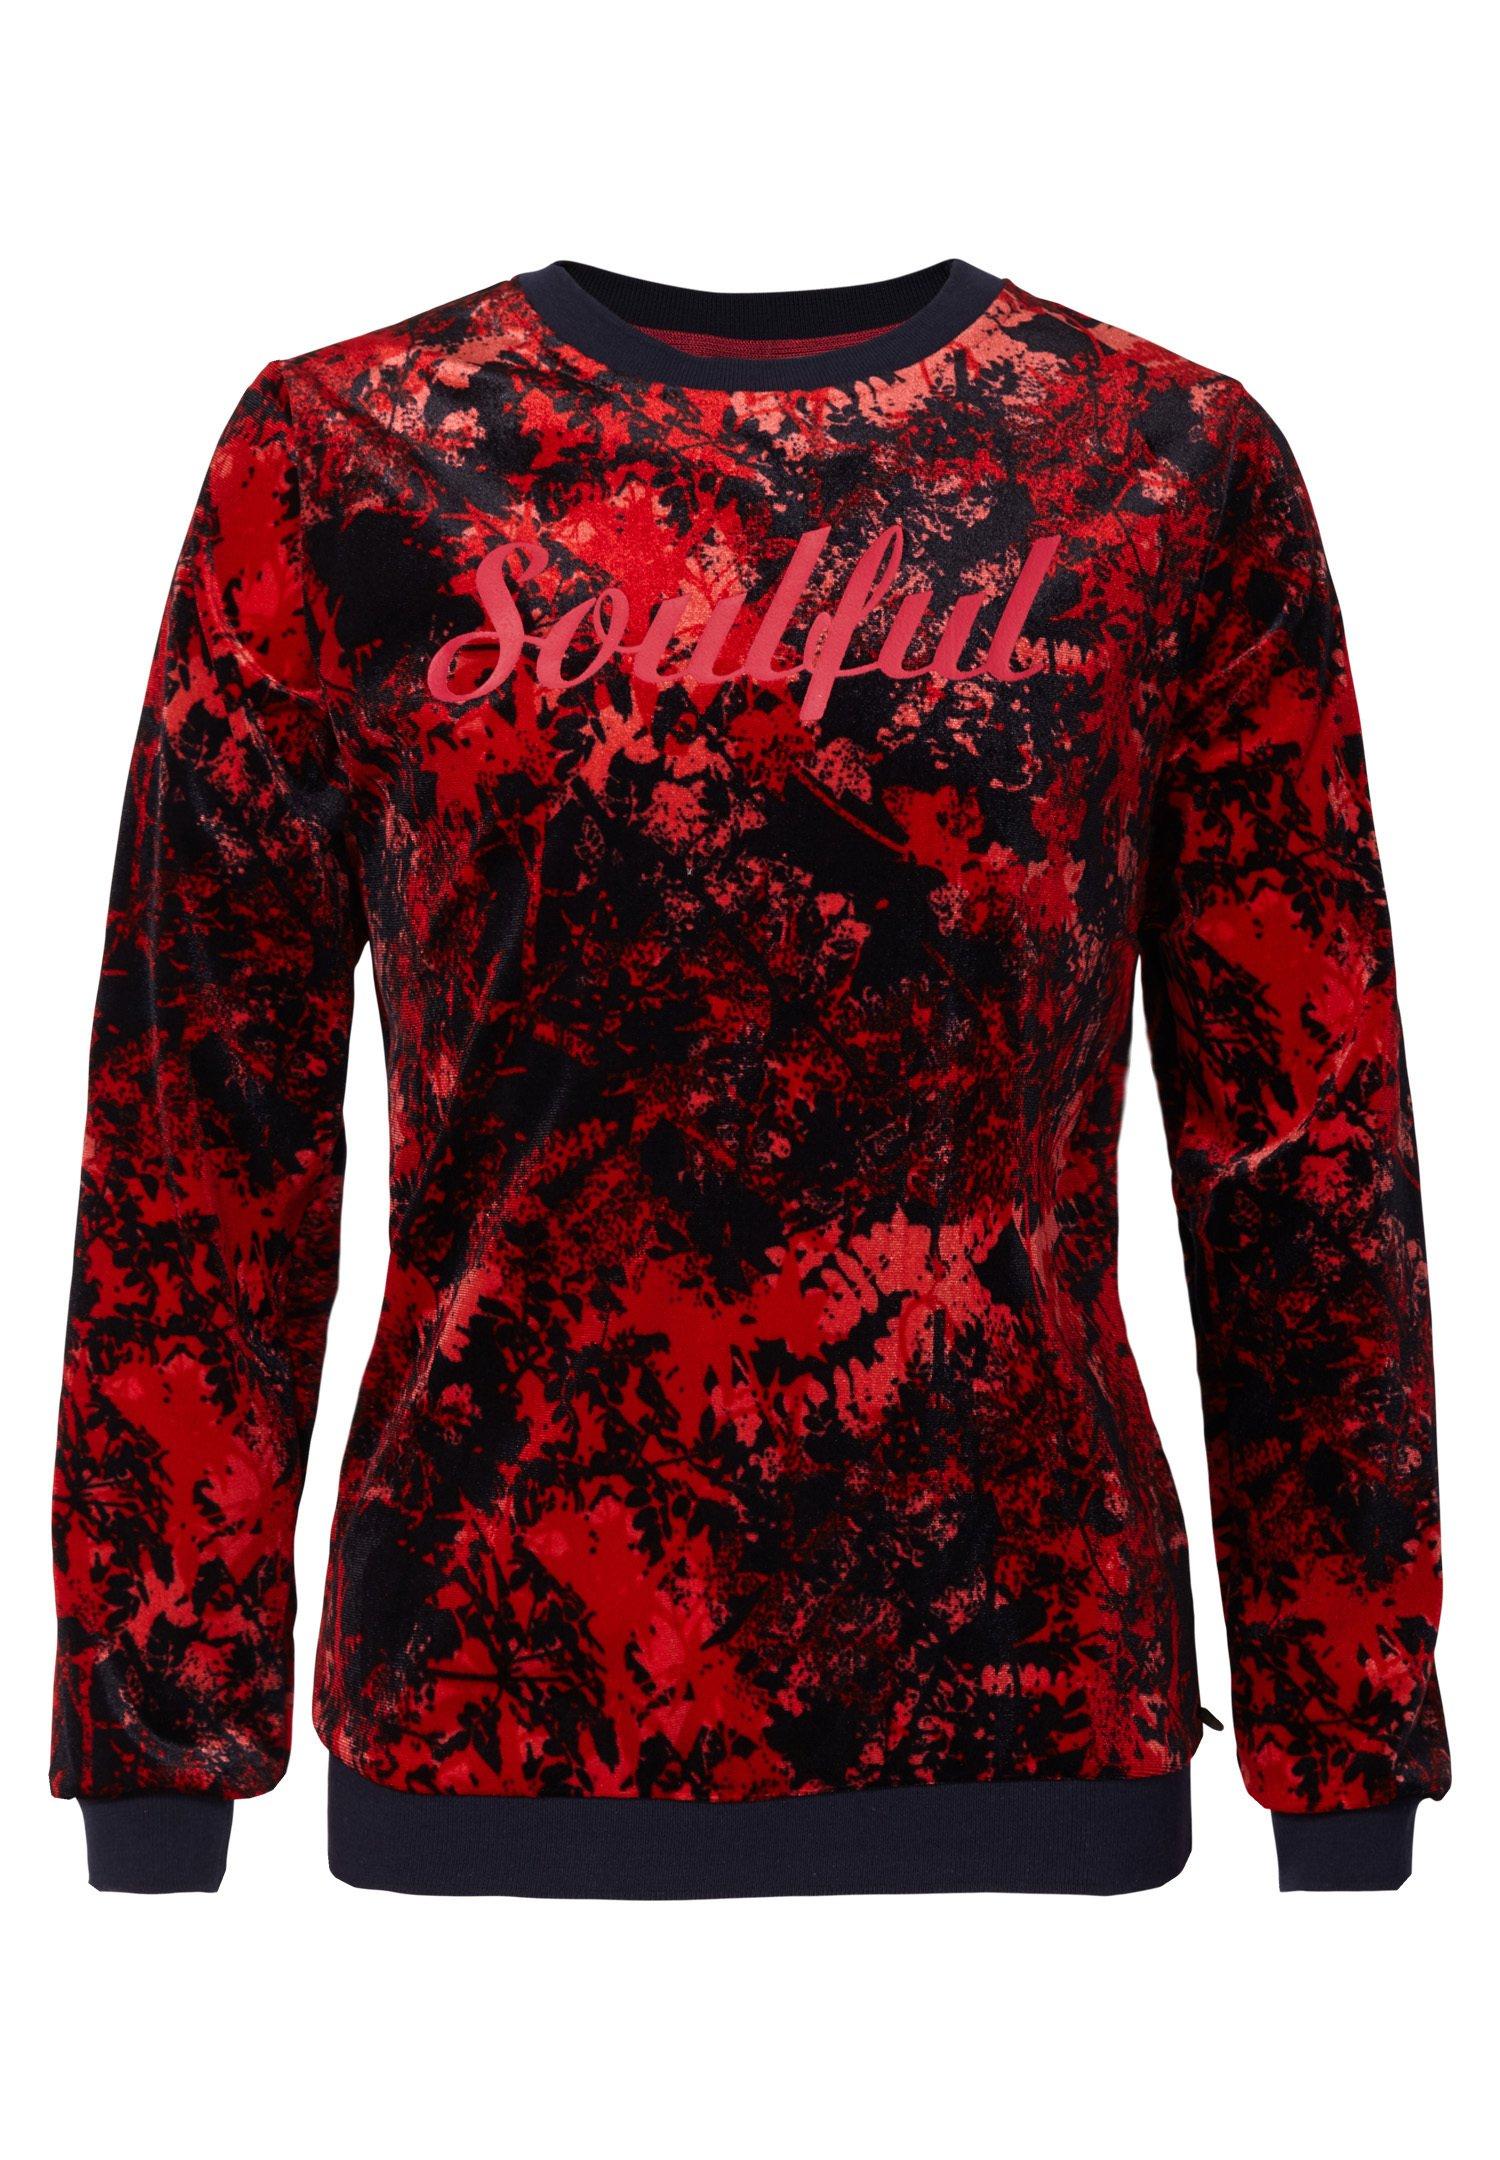 Offer Wholesale Petrol Industries SWEATSHIRT - Sweatshirt - salsa   kids's clothing 2020 PV7IU